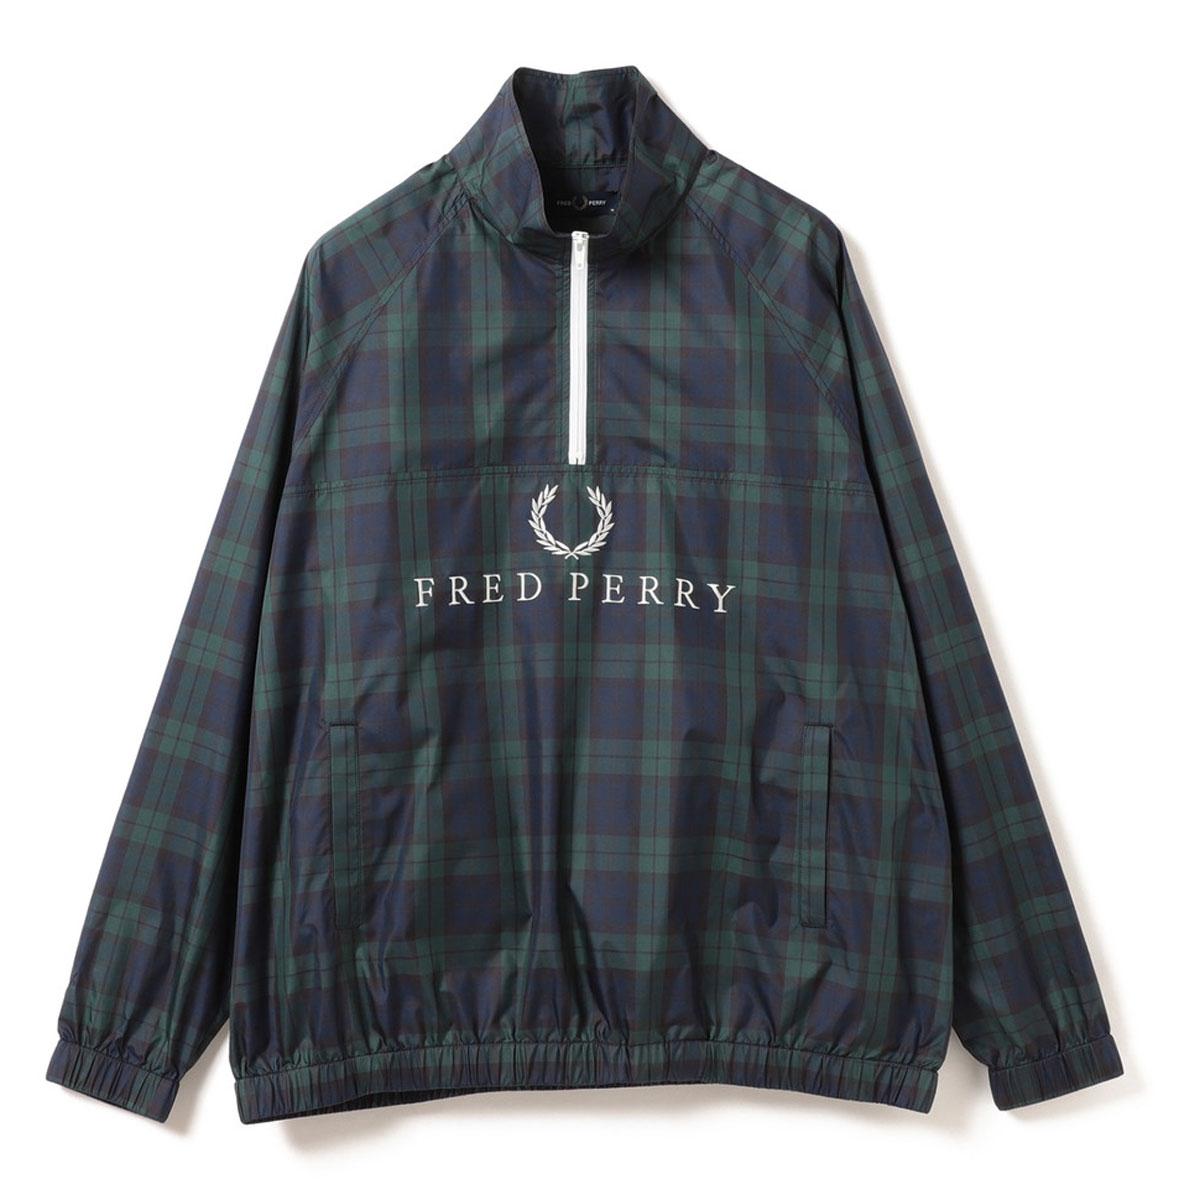 FRED PERRY×BEAMS GOLF チェック ハーフジップ プルオーバー ジャケット